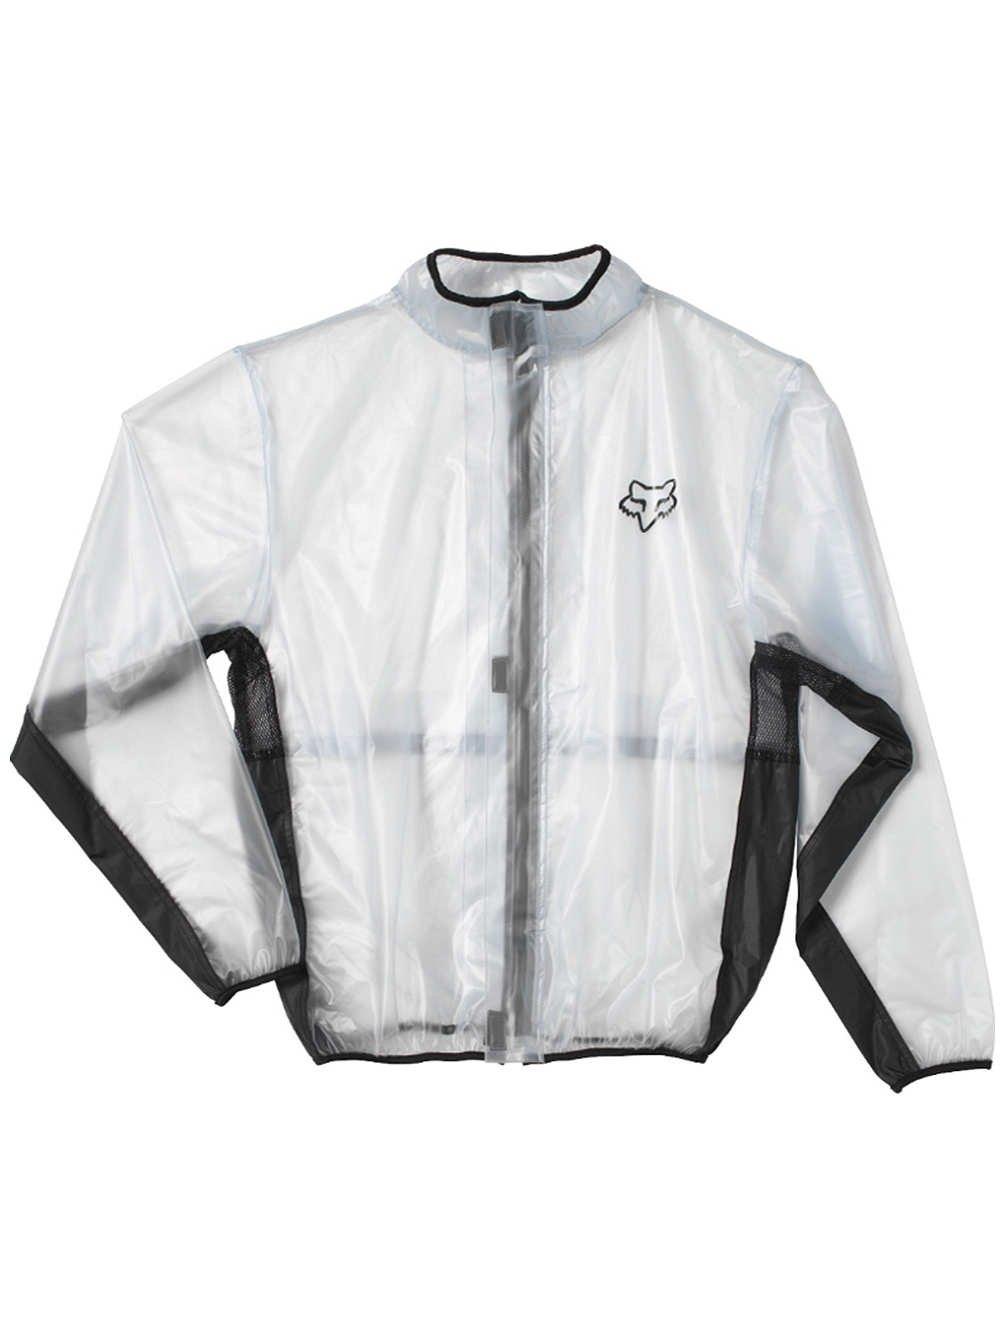 Fox Racing 2019 Youth MX Fluid Jacket (SMALL) (BOYS)